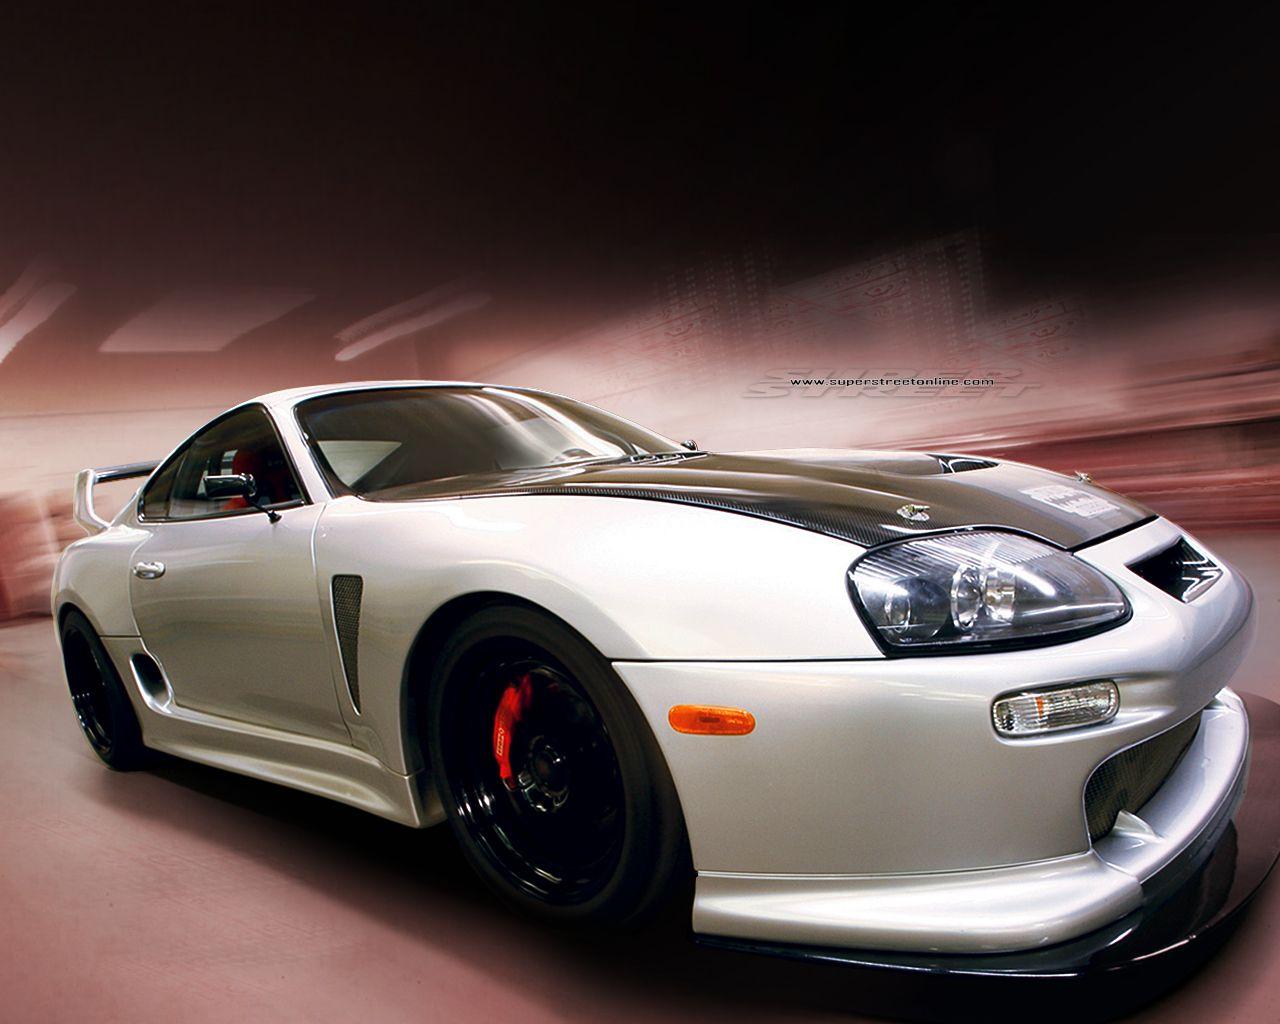 White Supra Wallpaper Hd Resolution Su4 Cars Pinterest Toyota